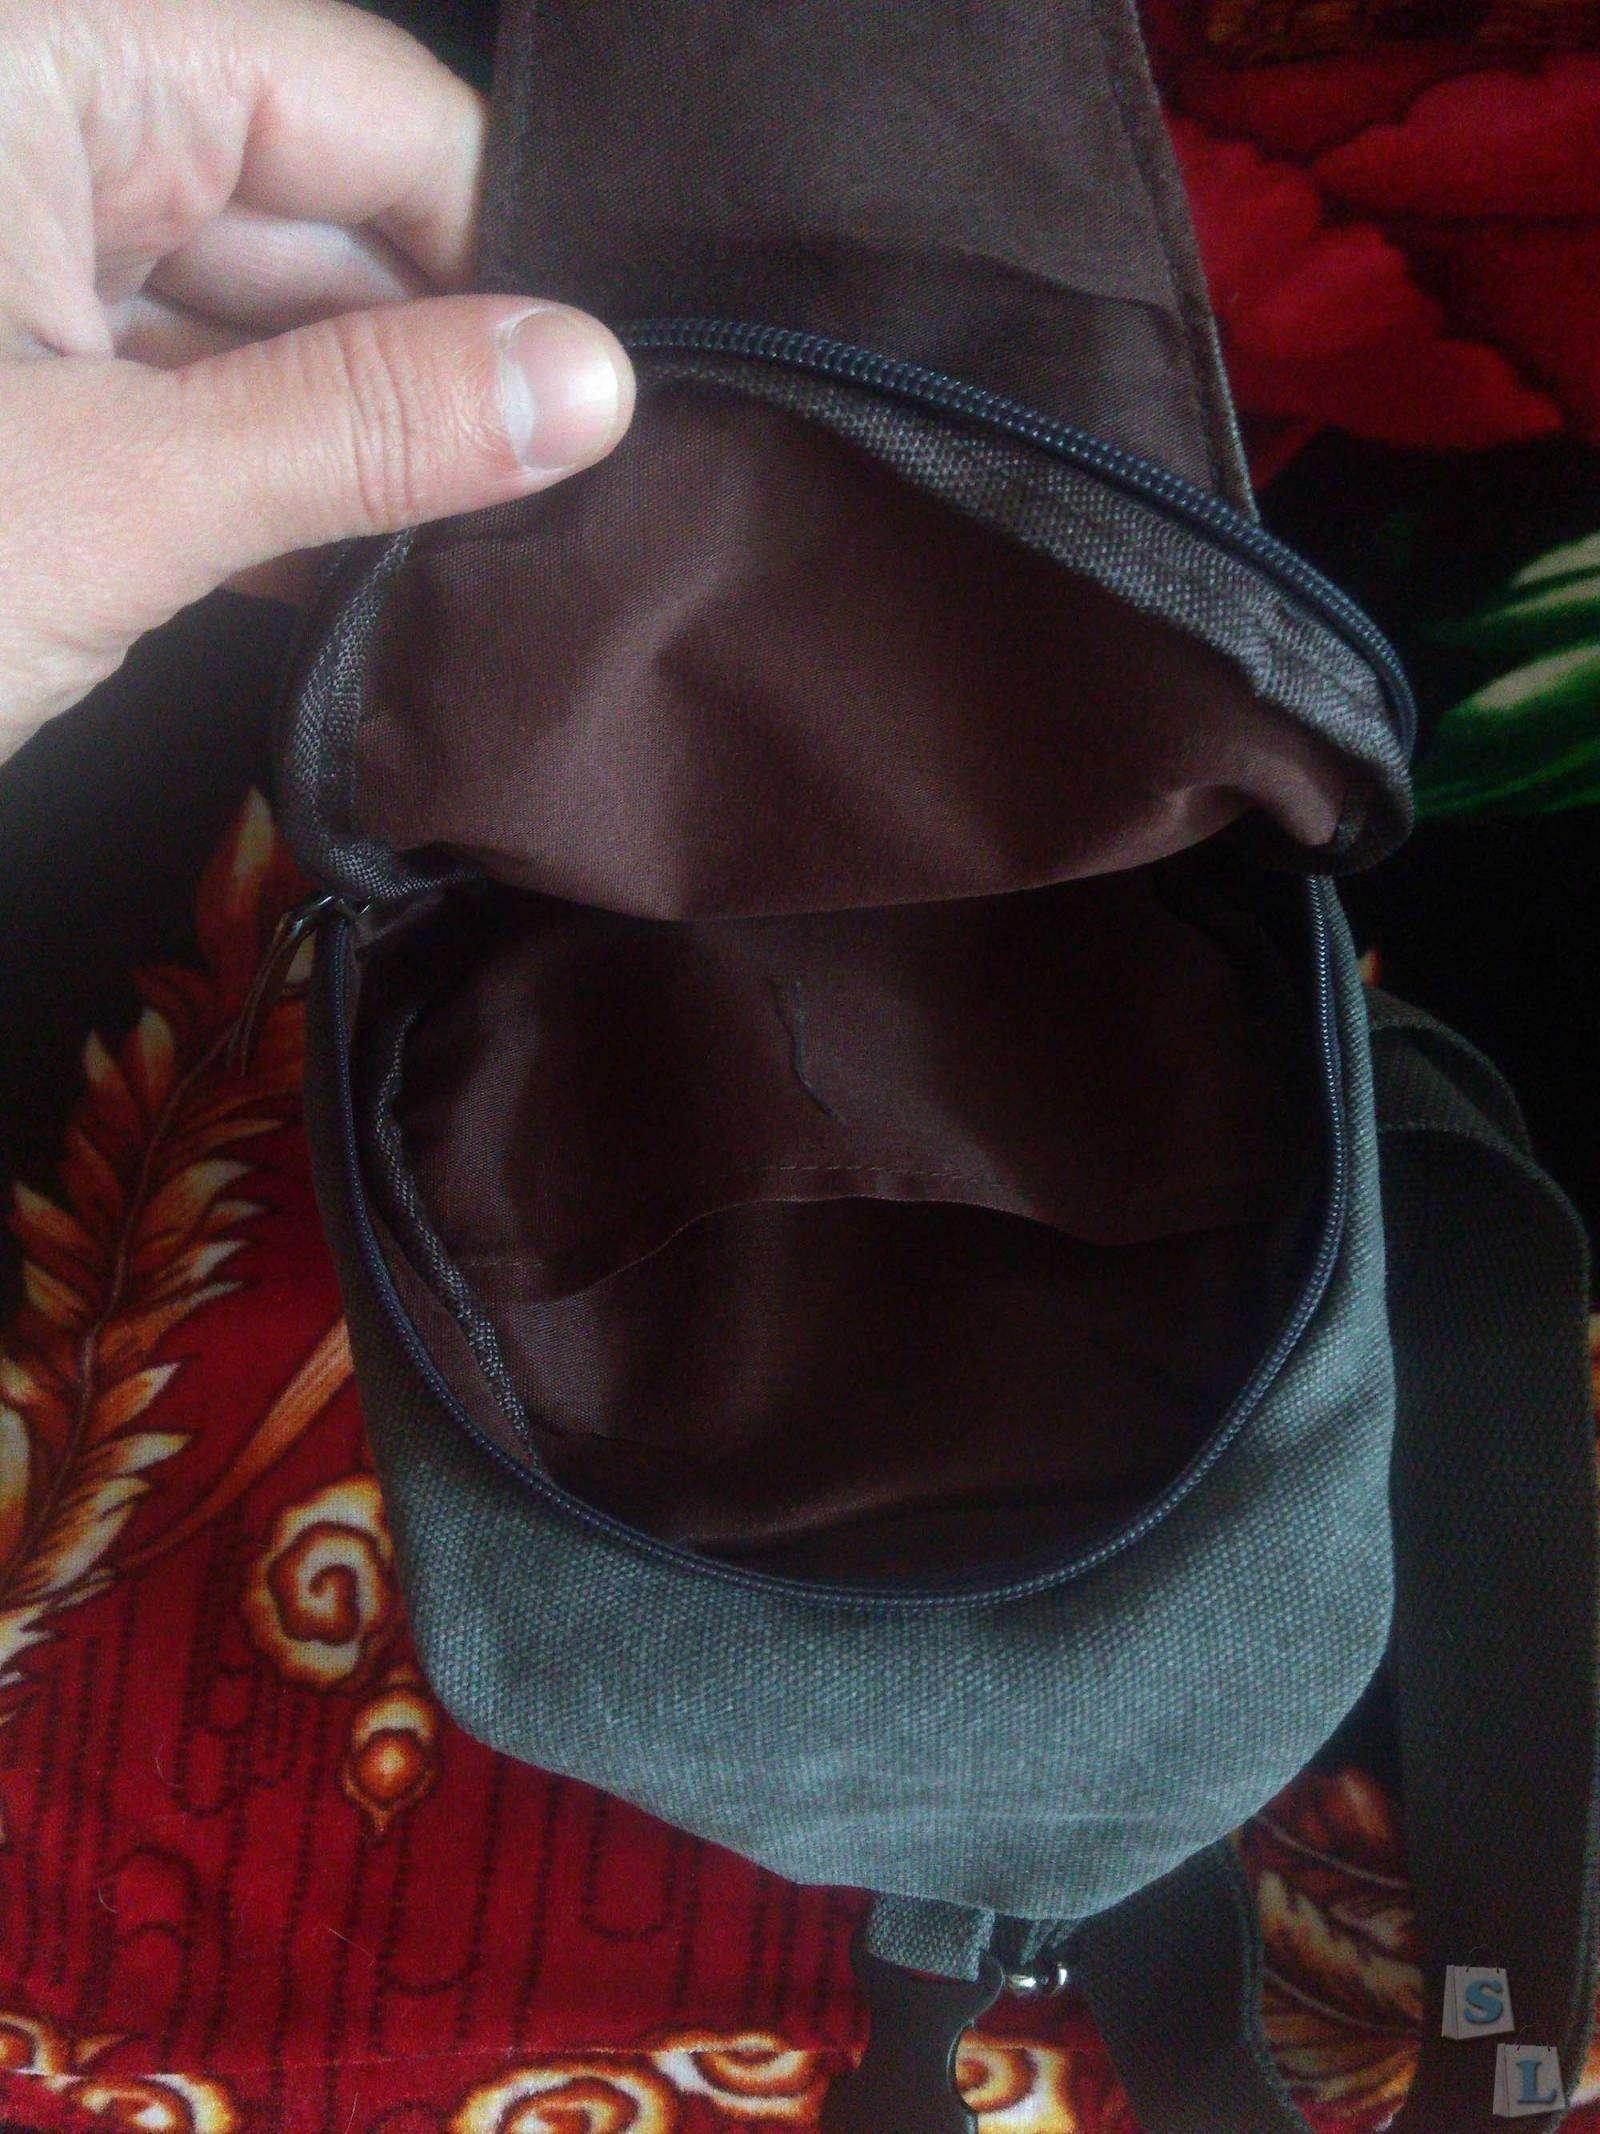 Aliexpress: Неплохая сумка